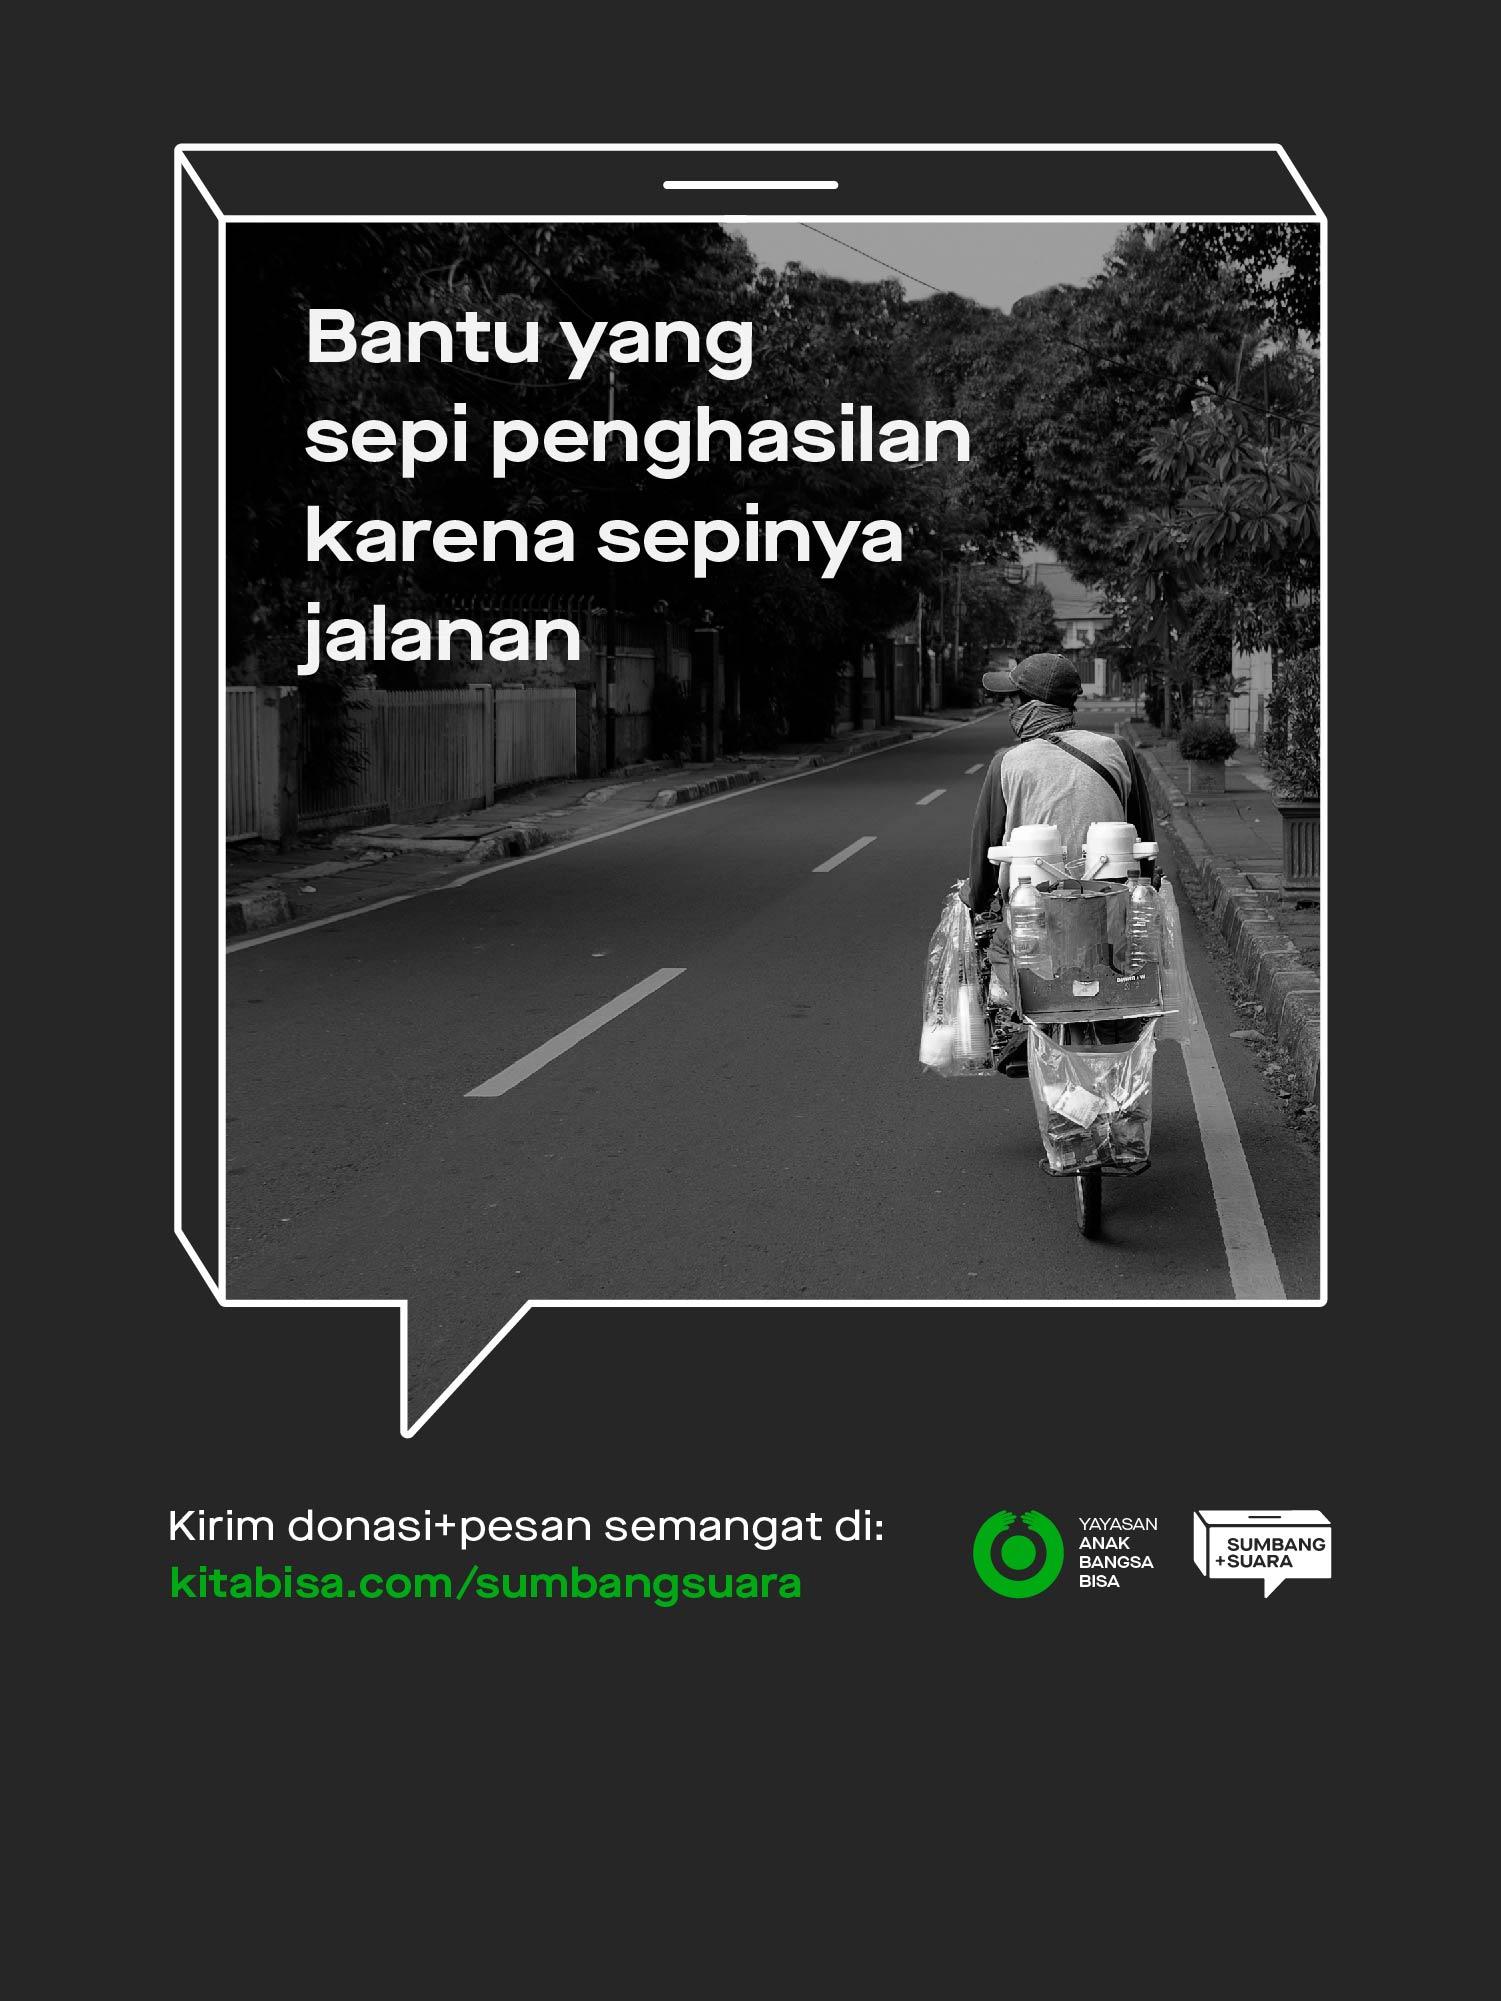 Gojek Super App Ojek Line Taksi Line Pesan Makan